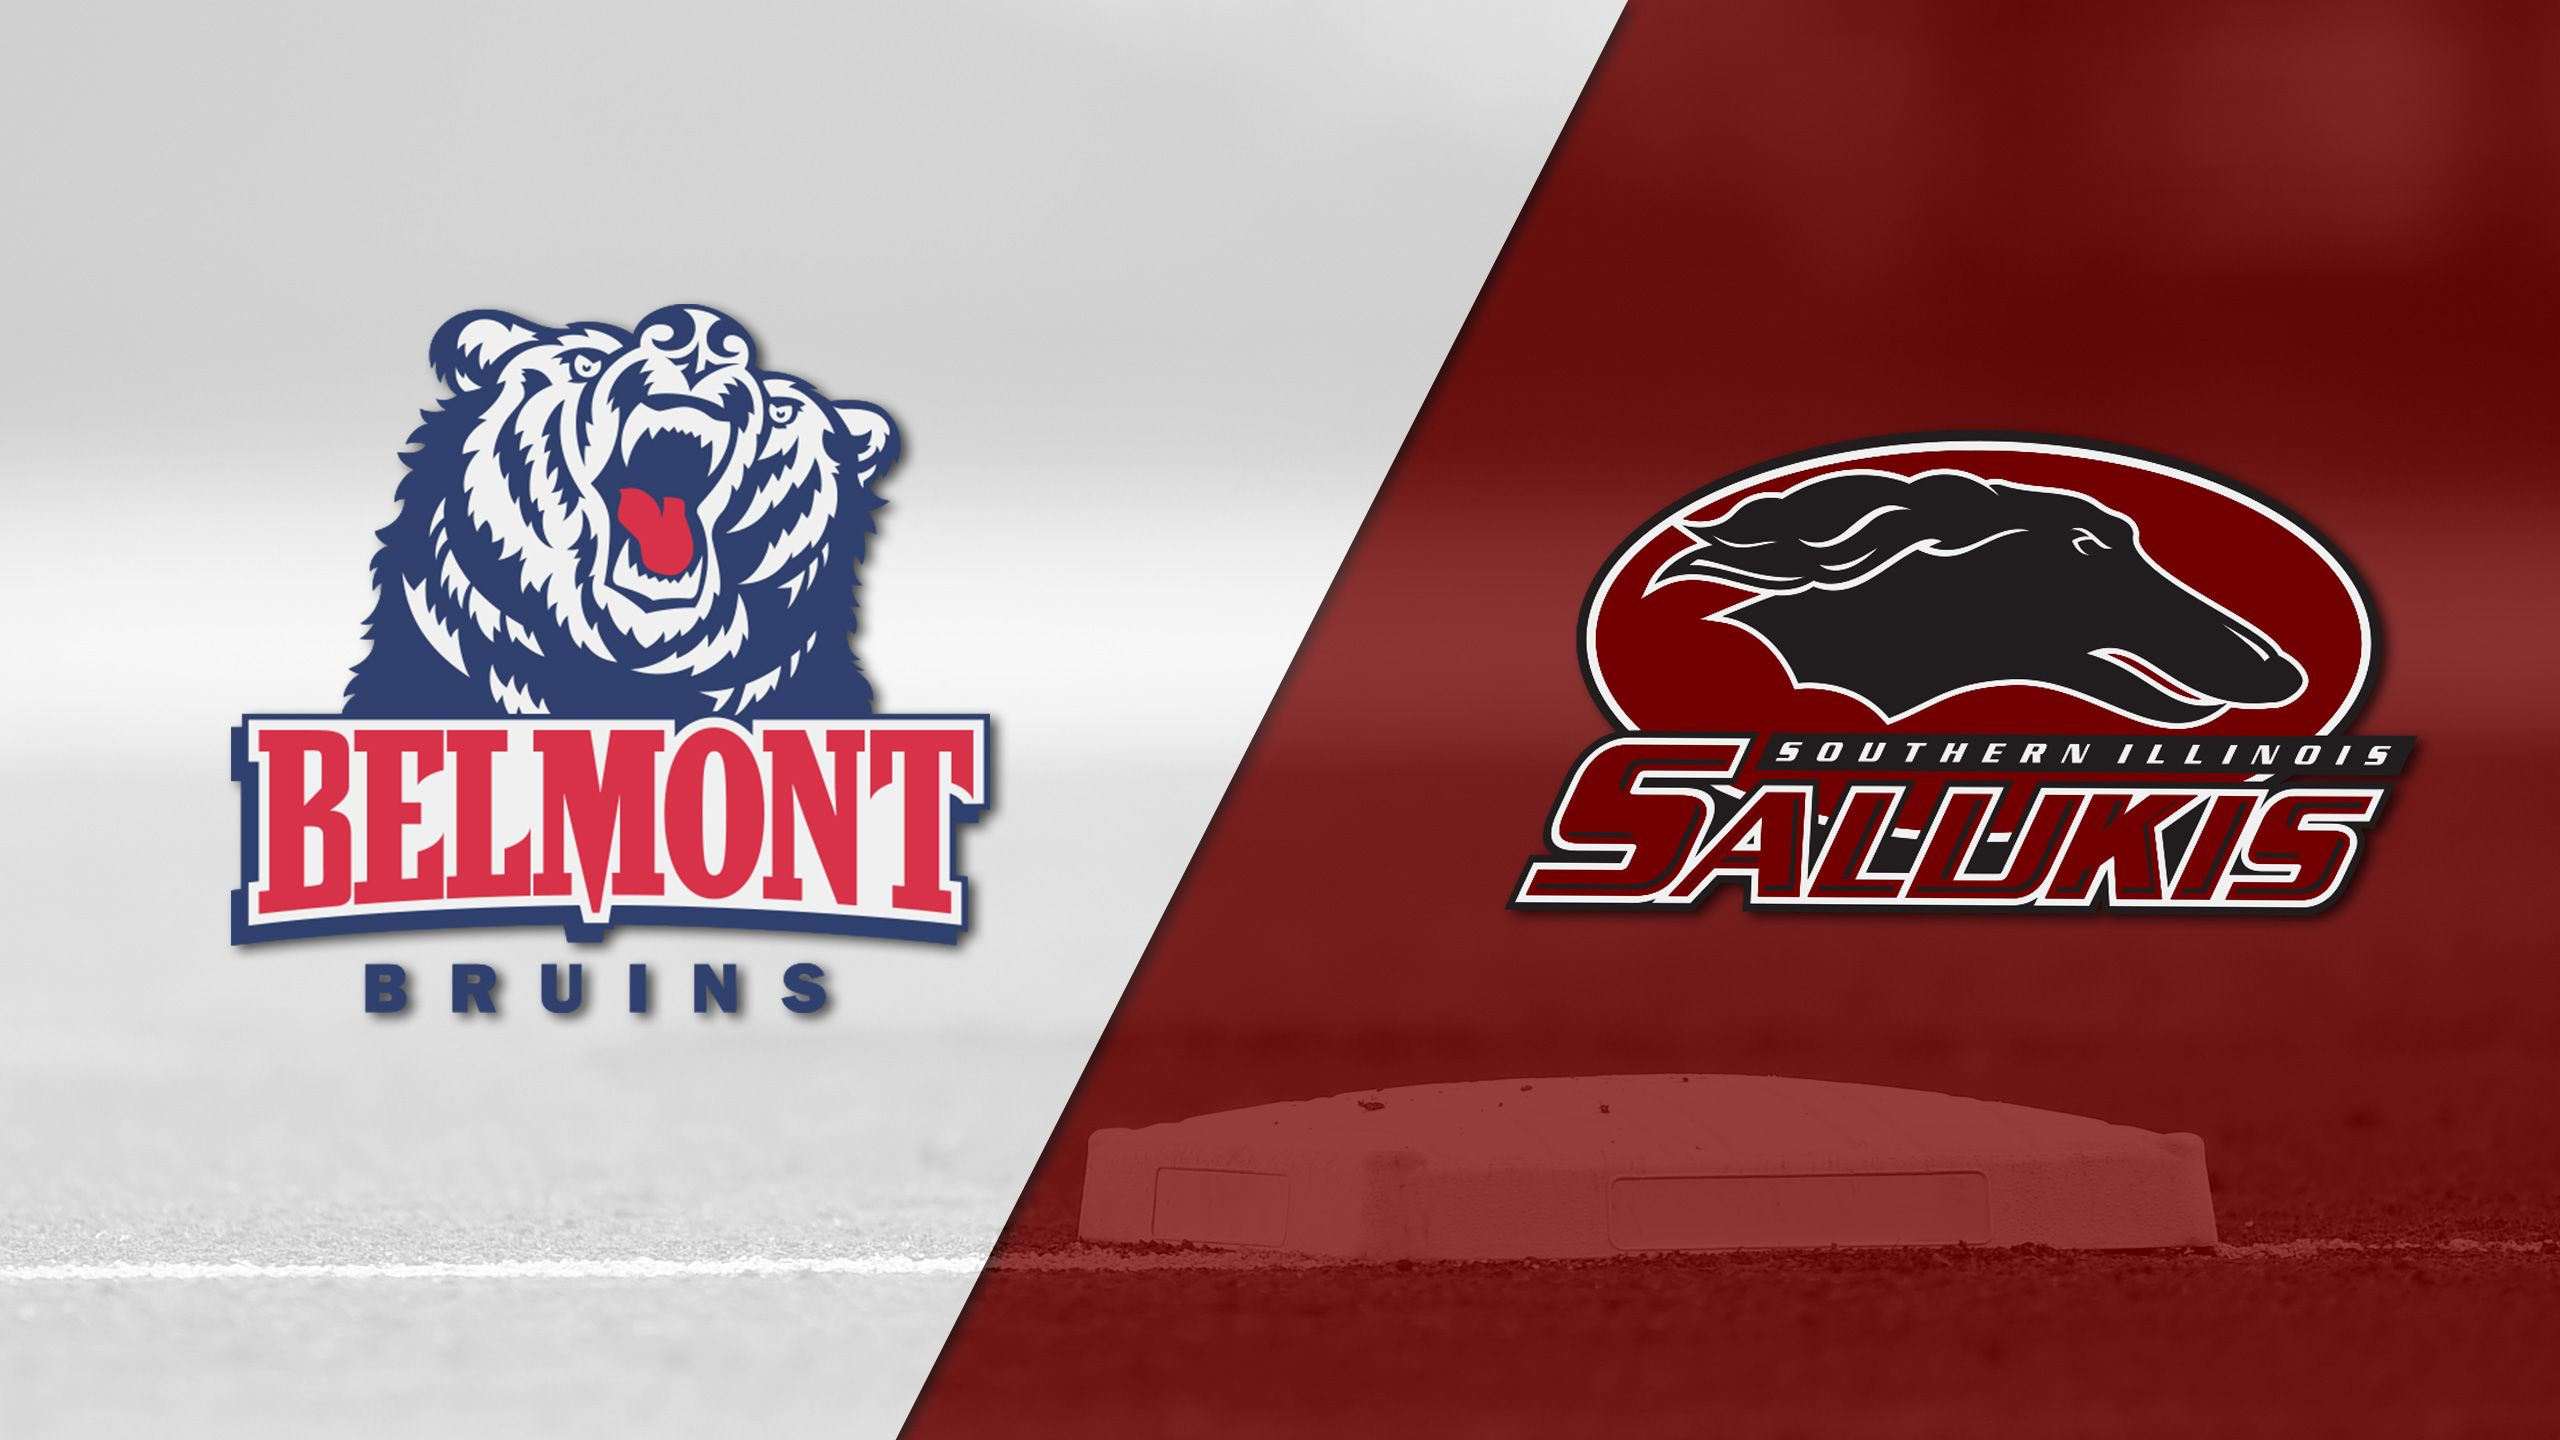 Belmont vs. Southern Illinois (Baseball)